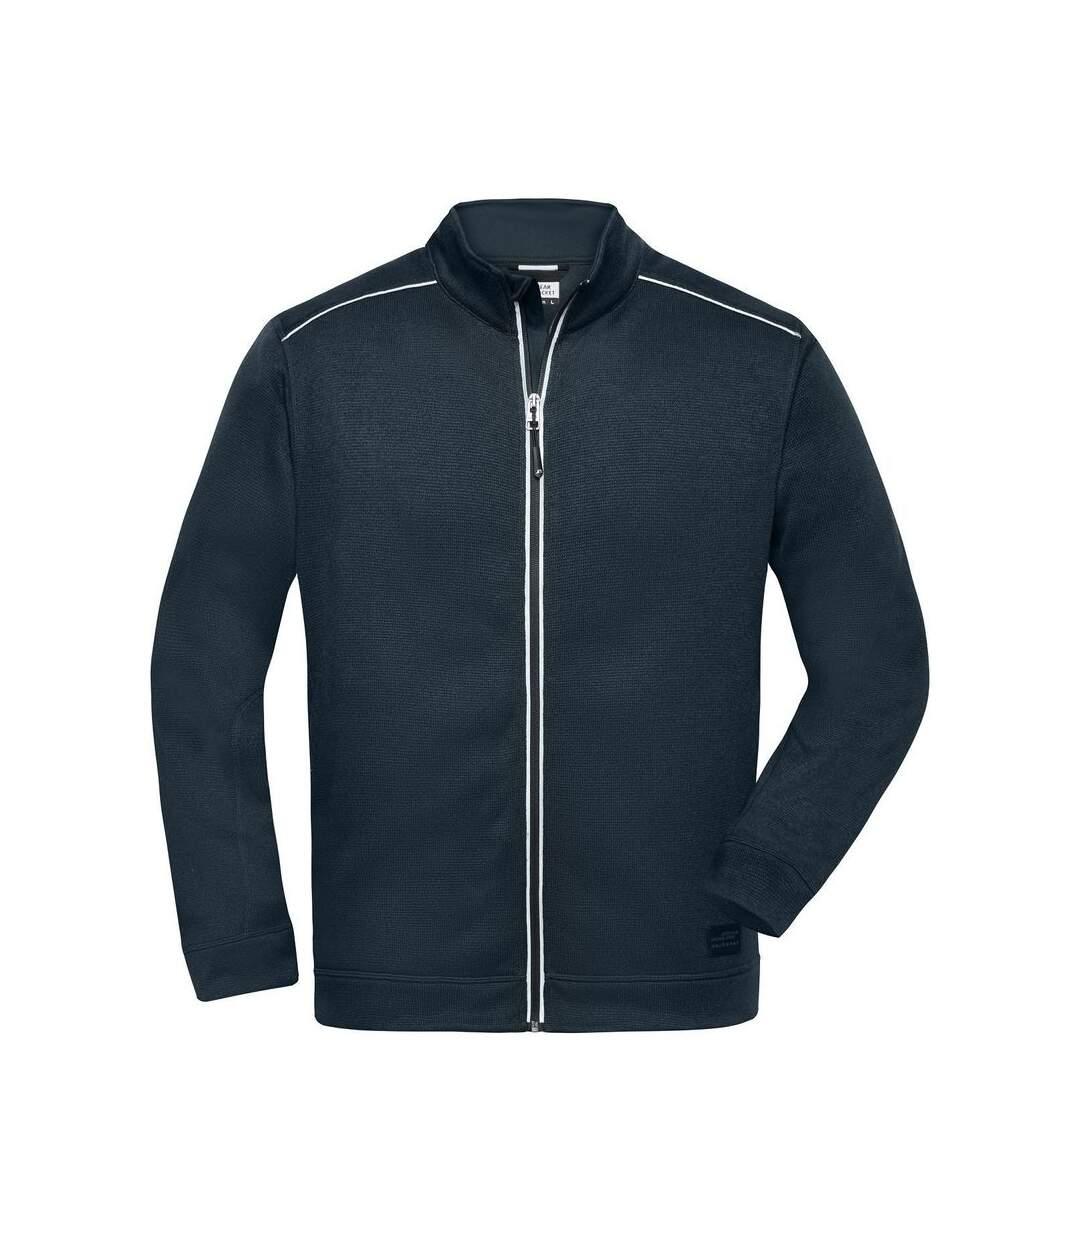 Veste zippée polaire workwear - homme - JN898 - bleu marine